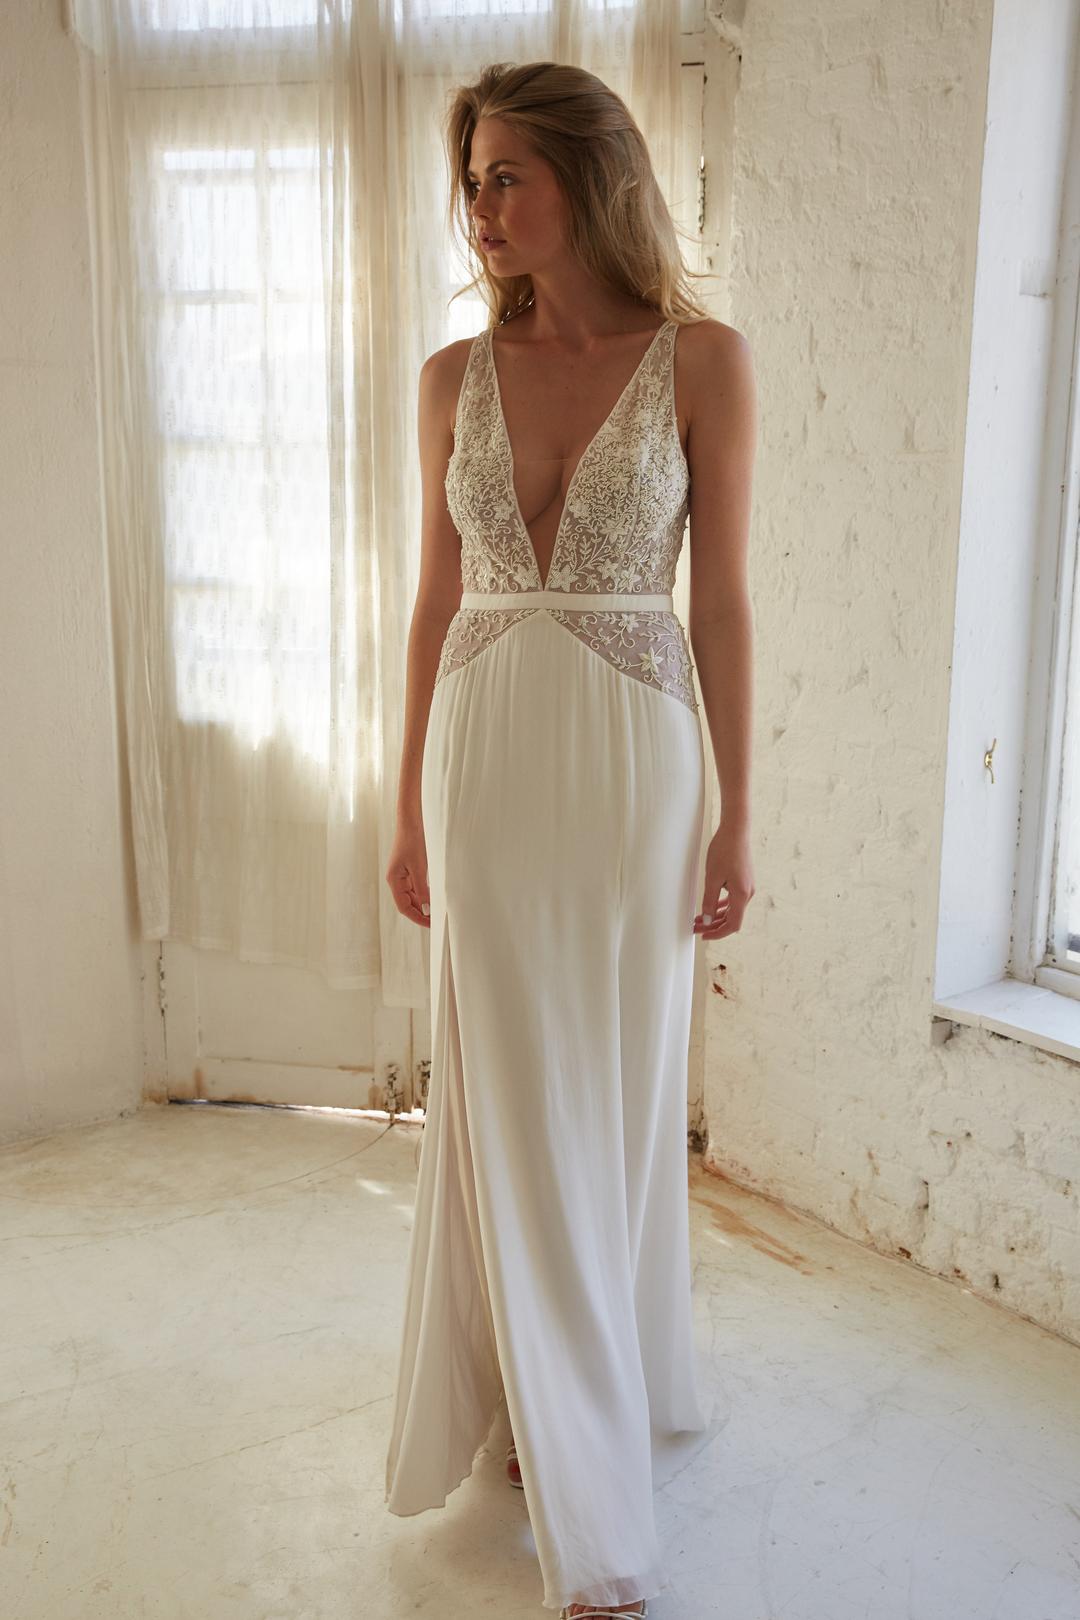 cybil gown dress photo